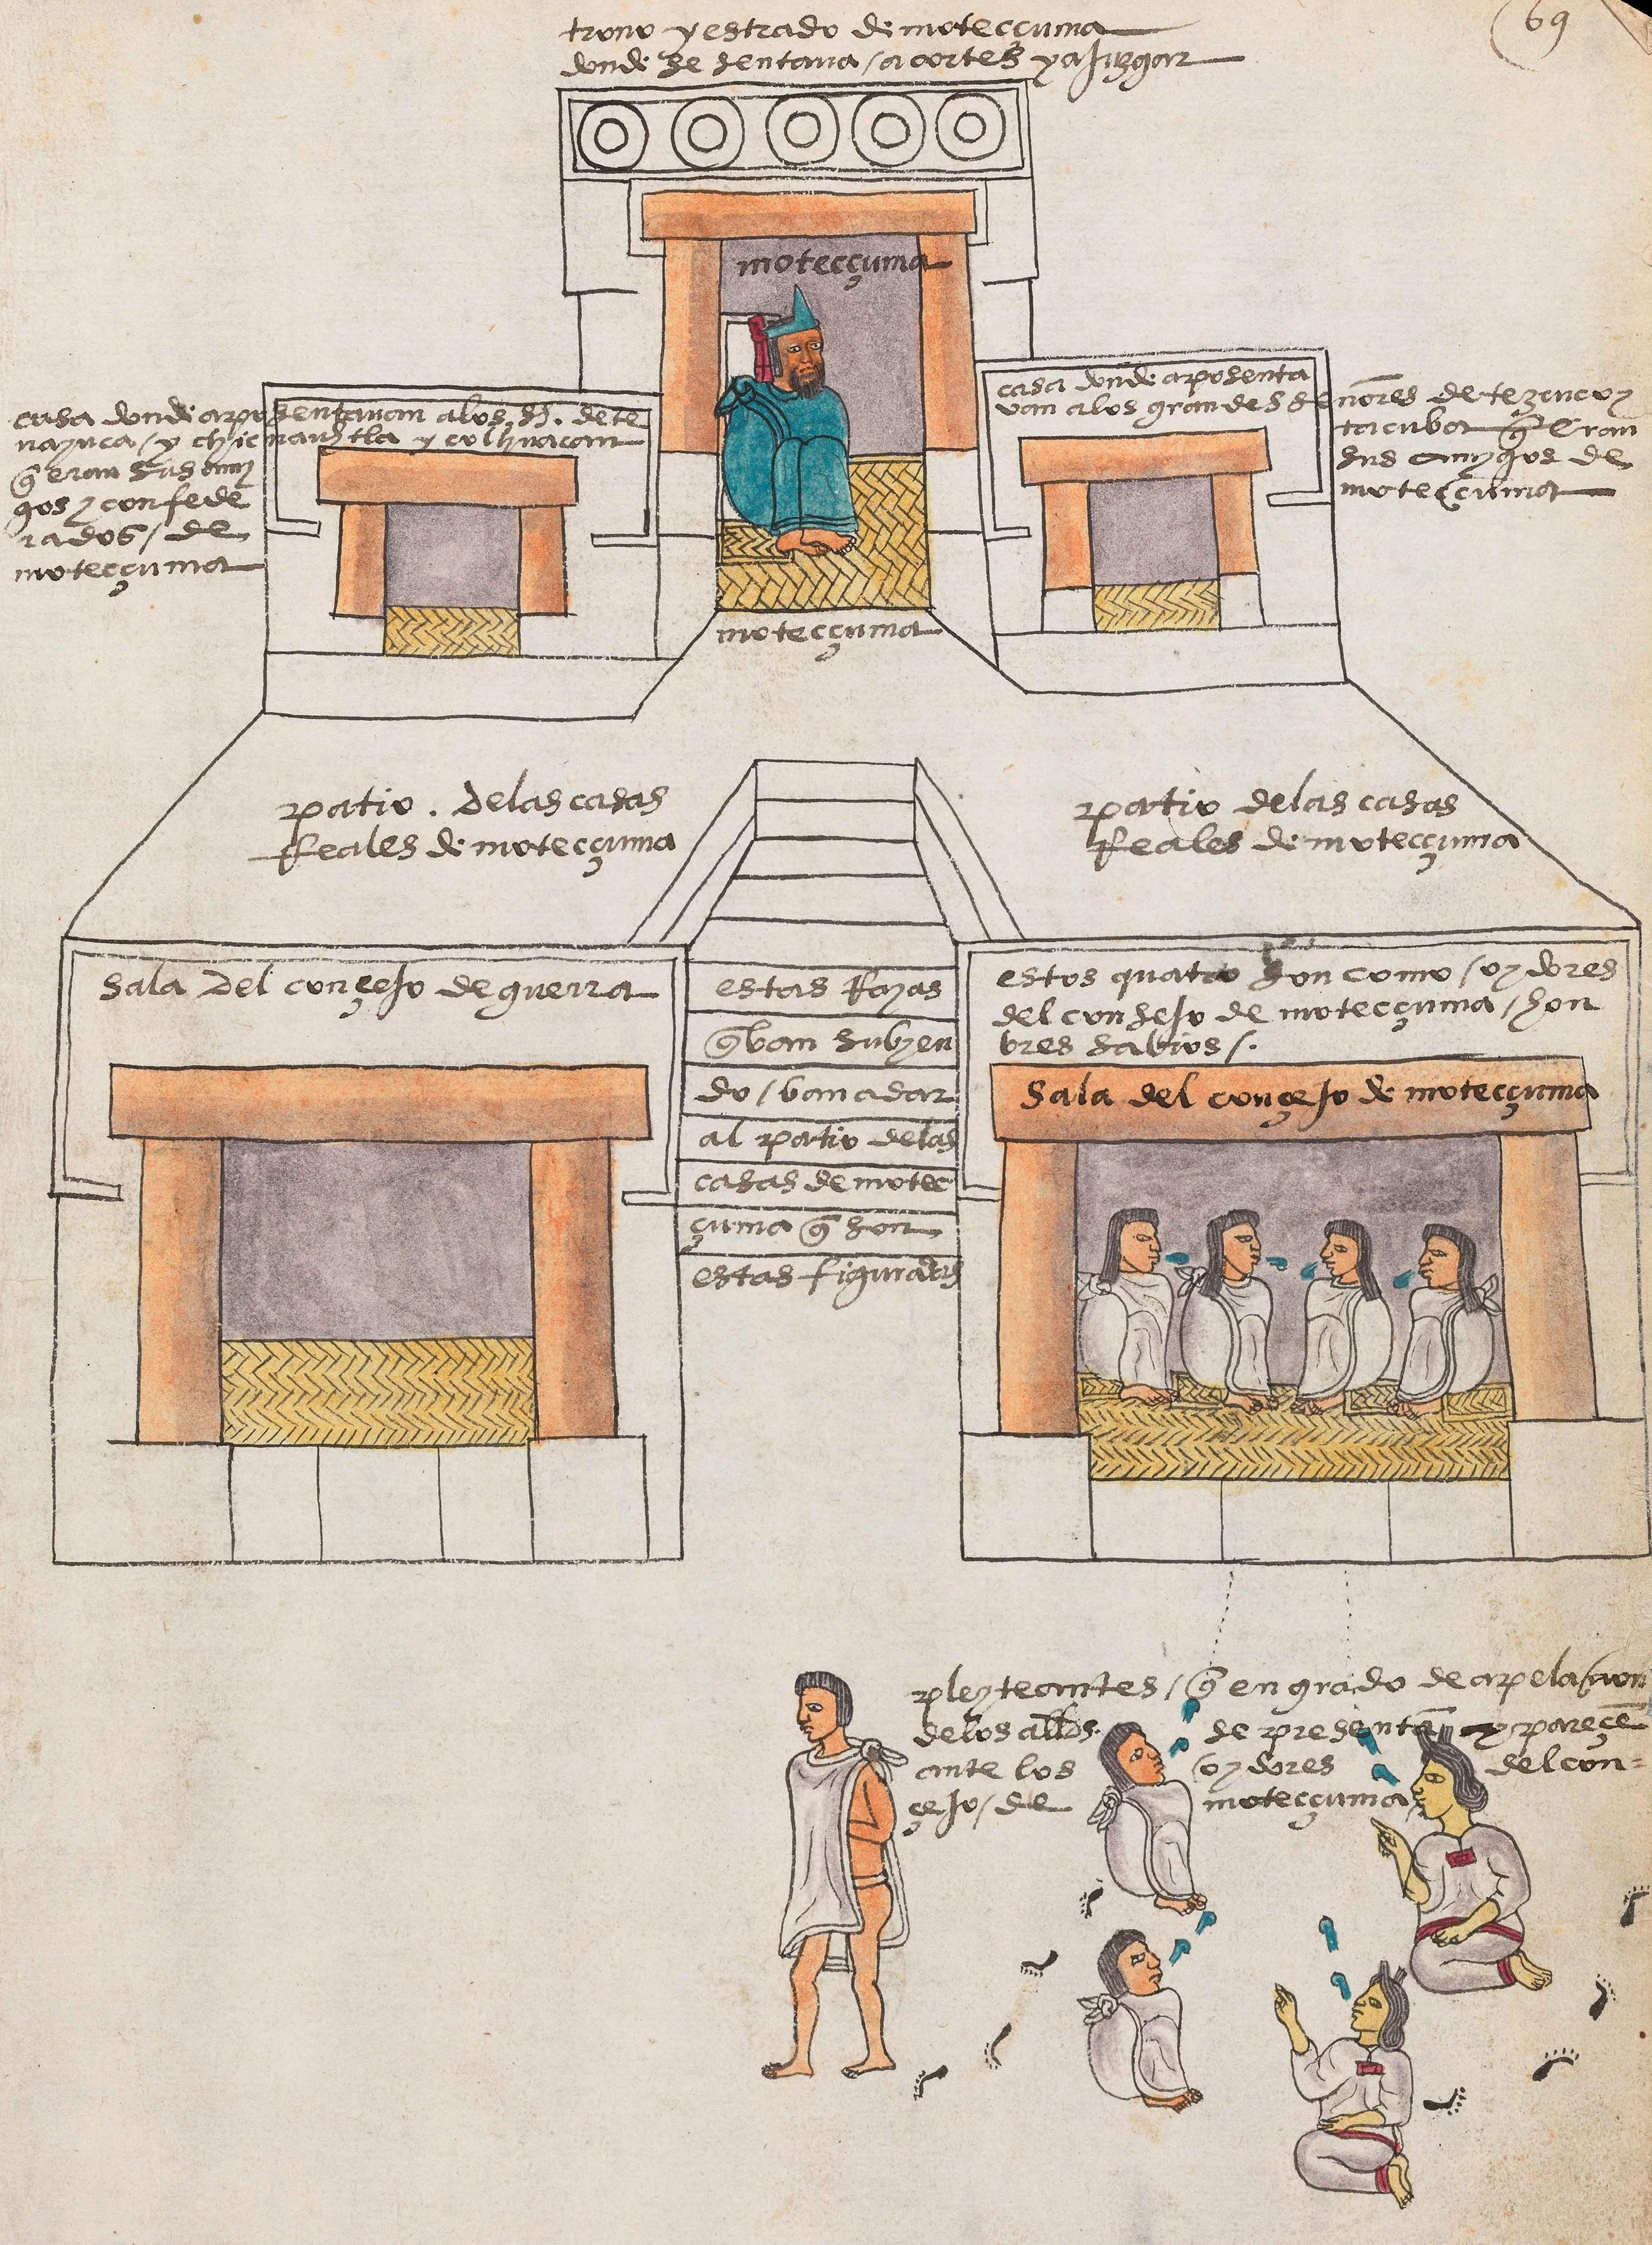 Codex Mendoza, rysunek pałacu, Moctezuma palace